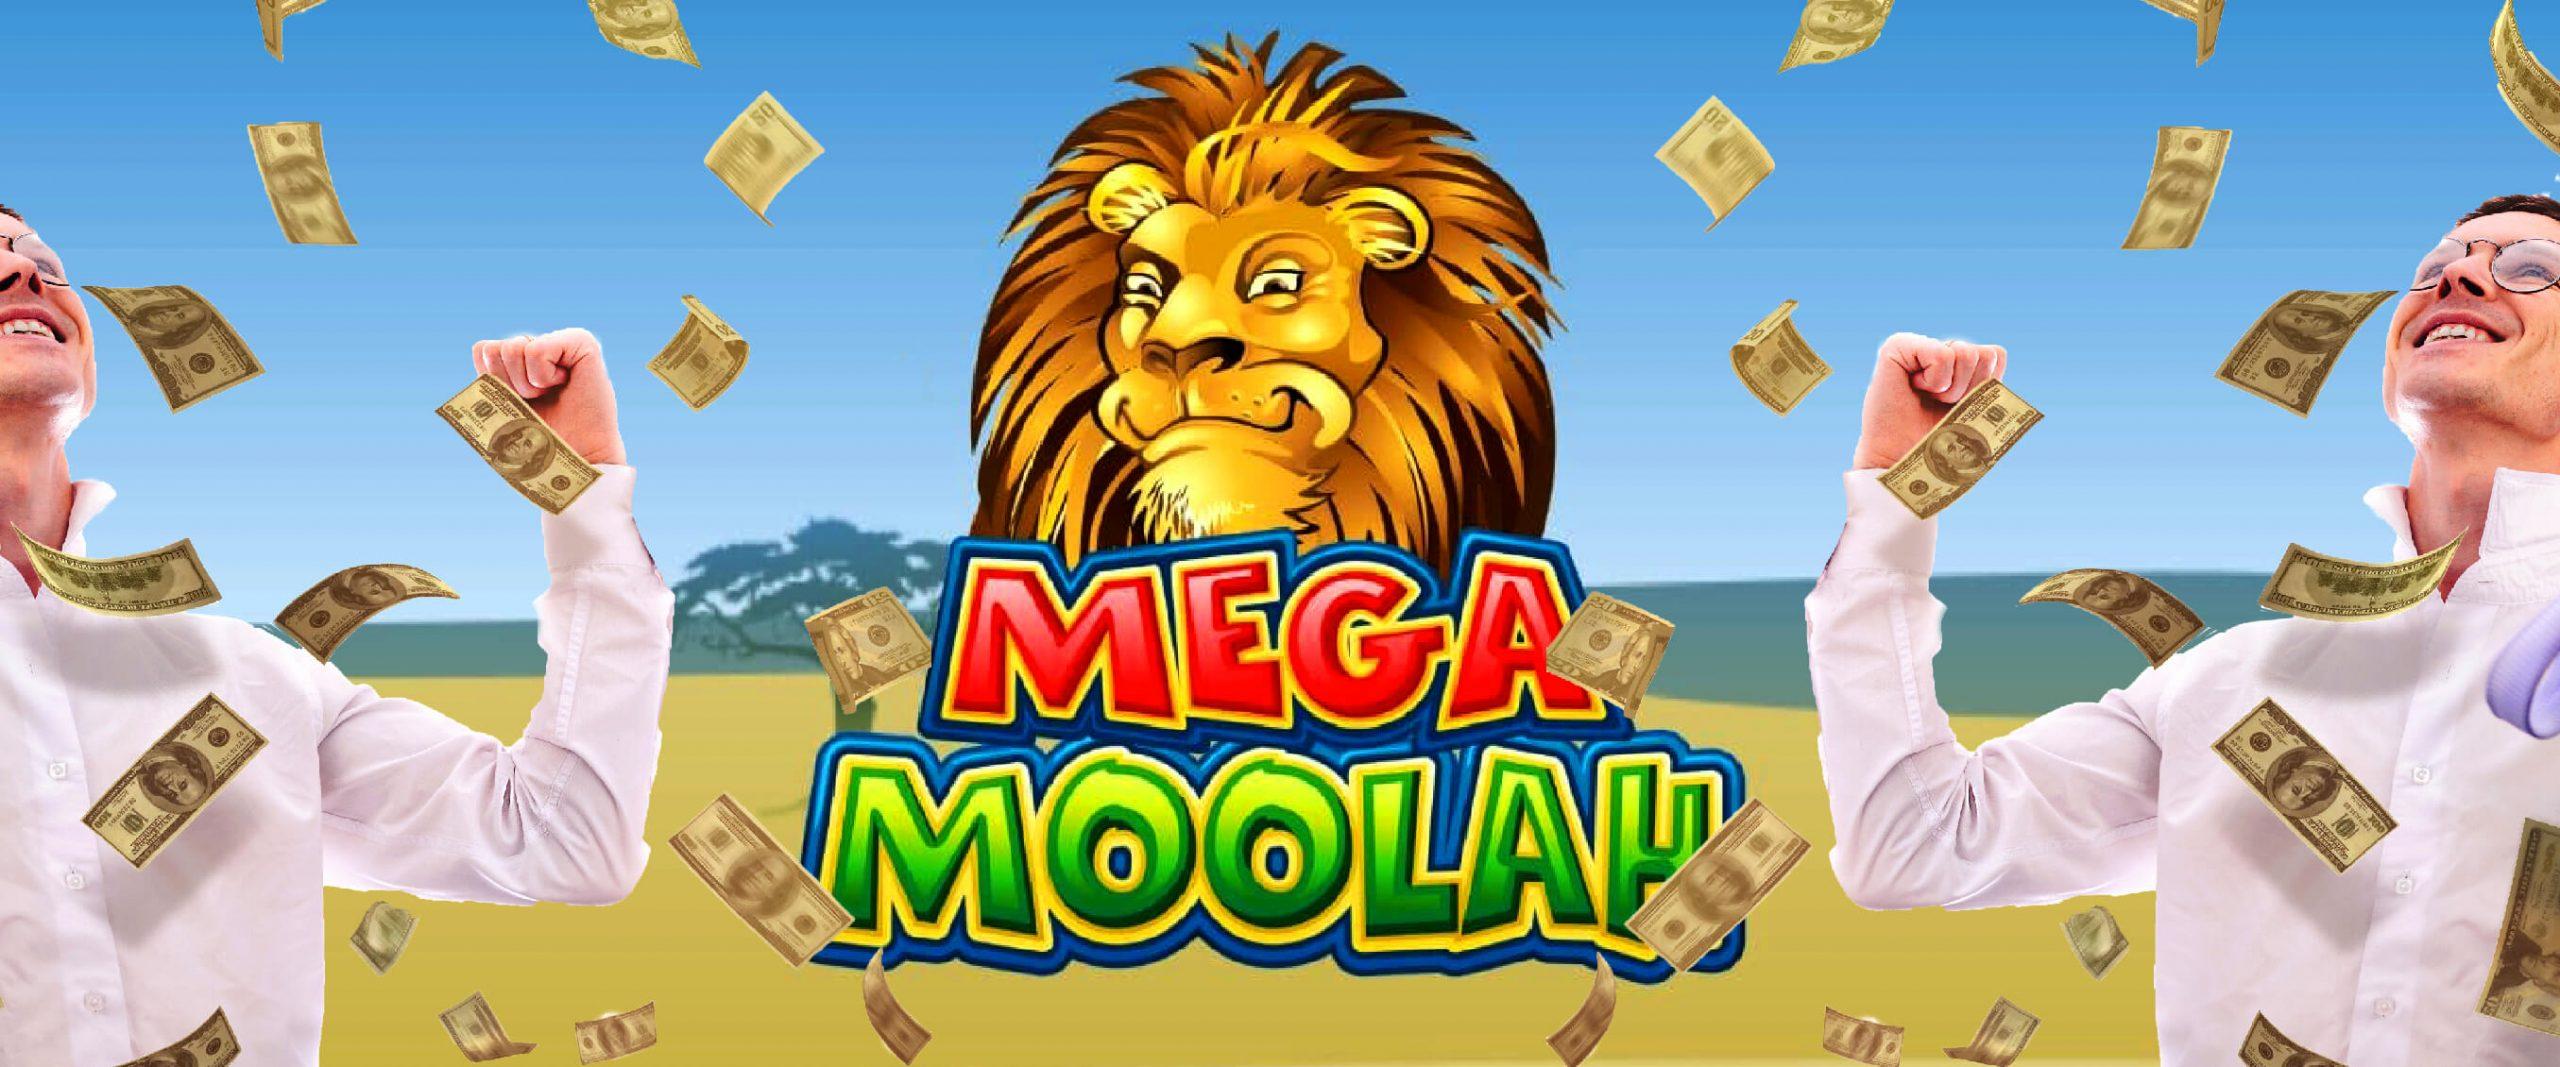 Pemain Optibet memenangkan Mega Moolah